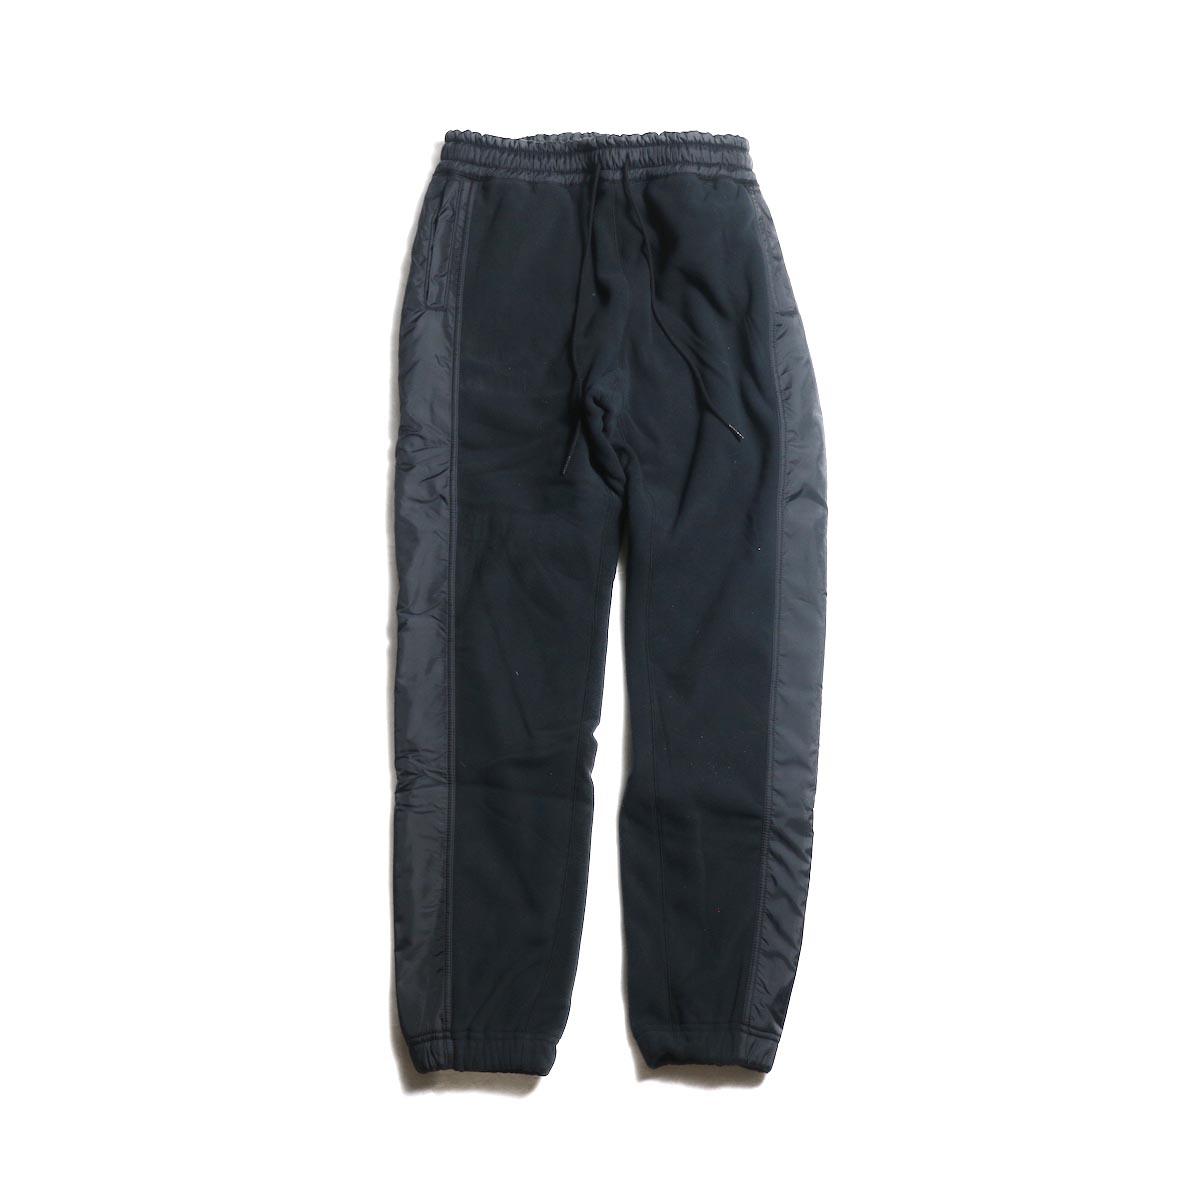 nonnative / HIKER EASY RIB PANTS POLY FLEECE POLARTEC® (Black)